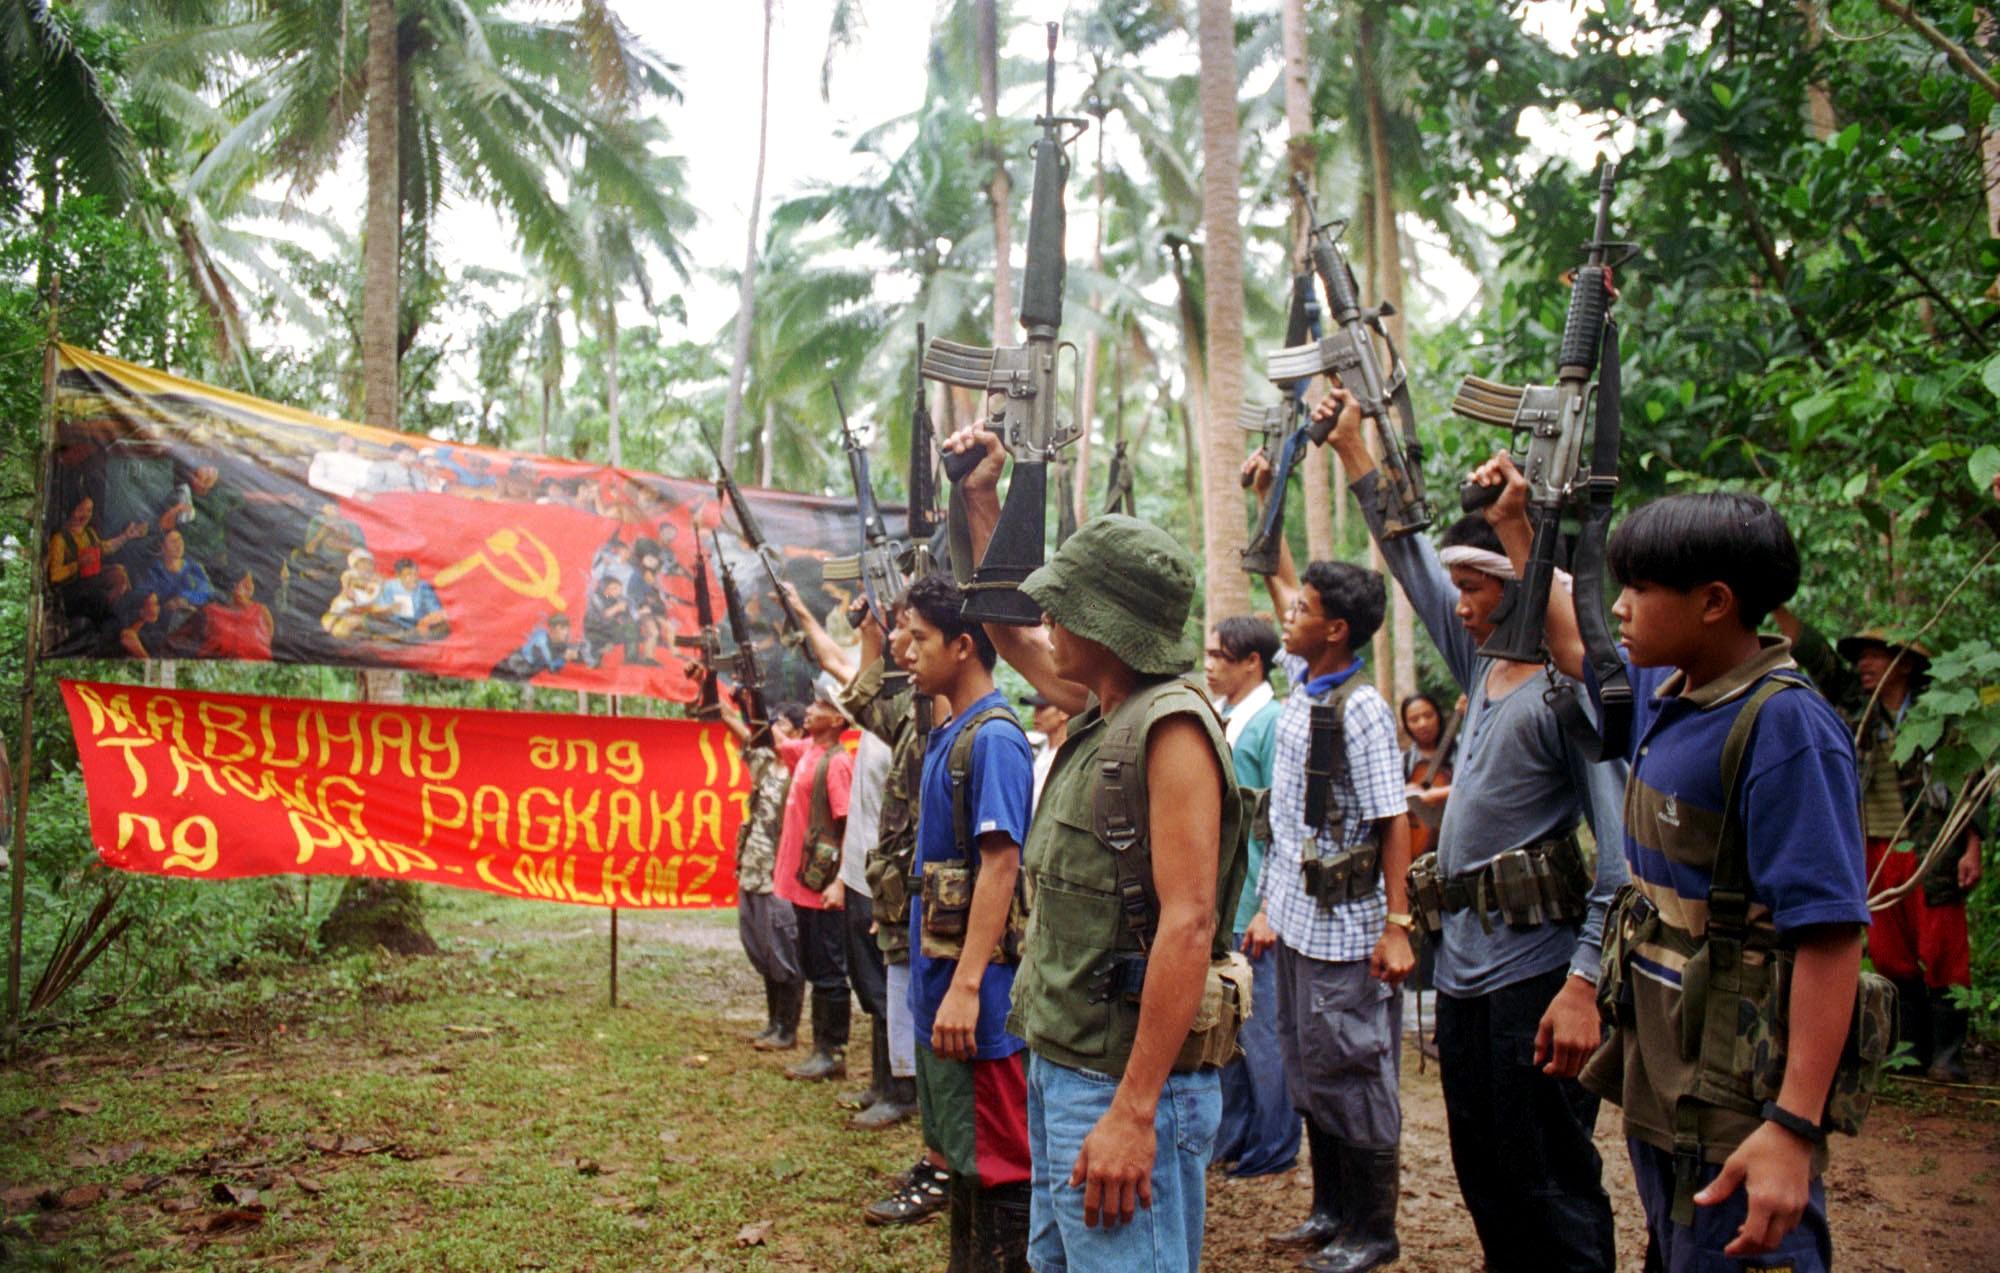 Mao more than ever: Filipino communists mark a half century